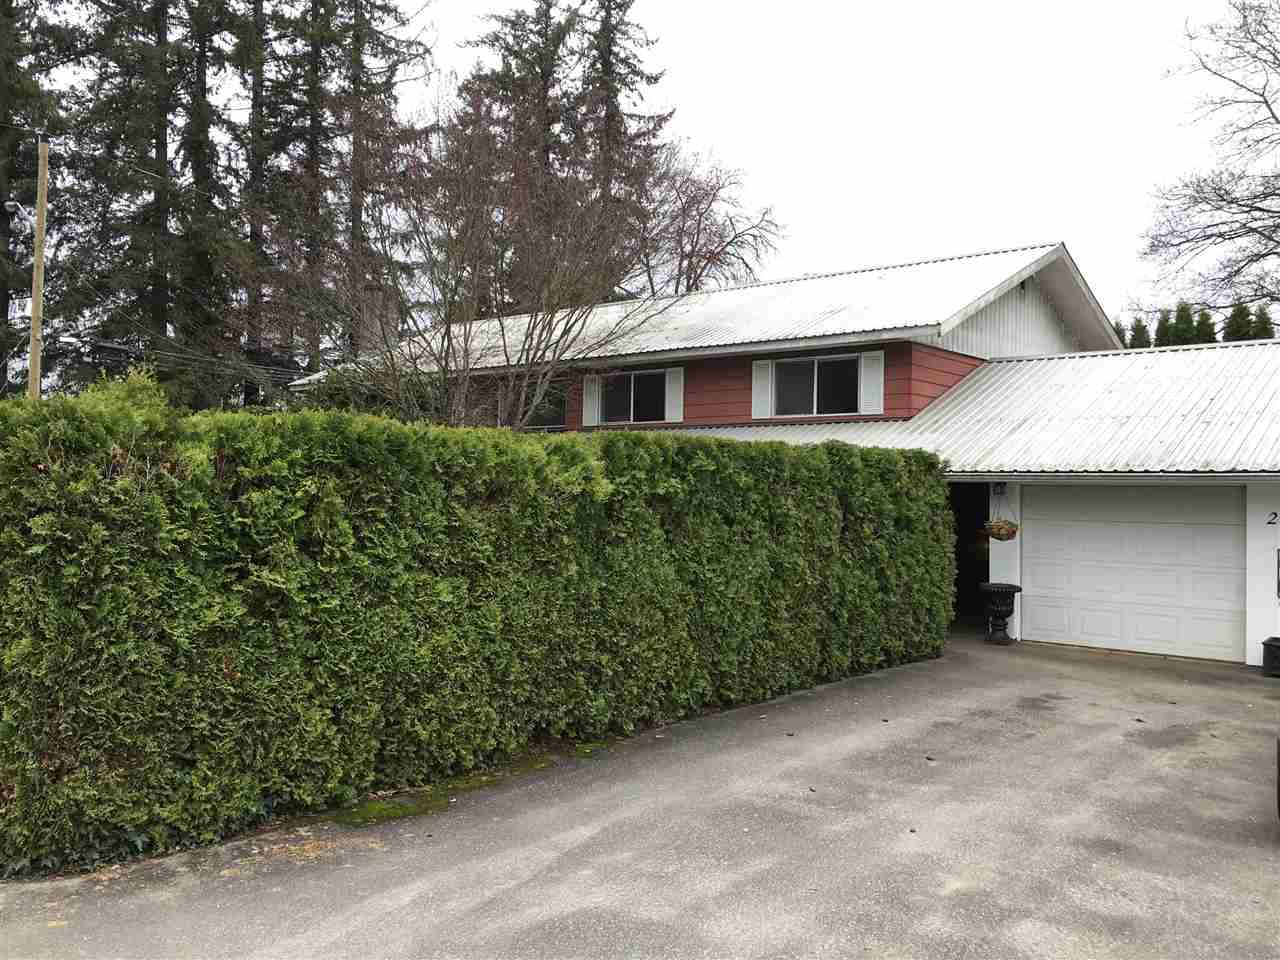 23165 88 AVENUE, Langley, BC, V1M 2R5 Primary Photo